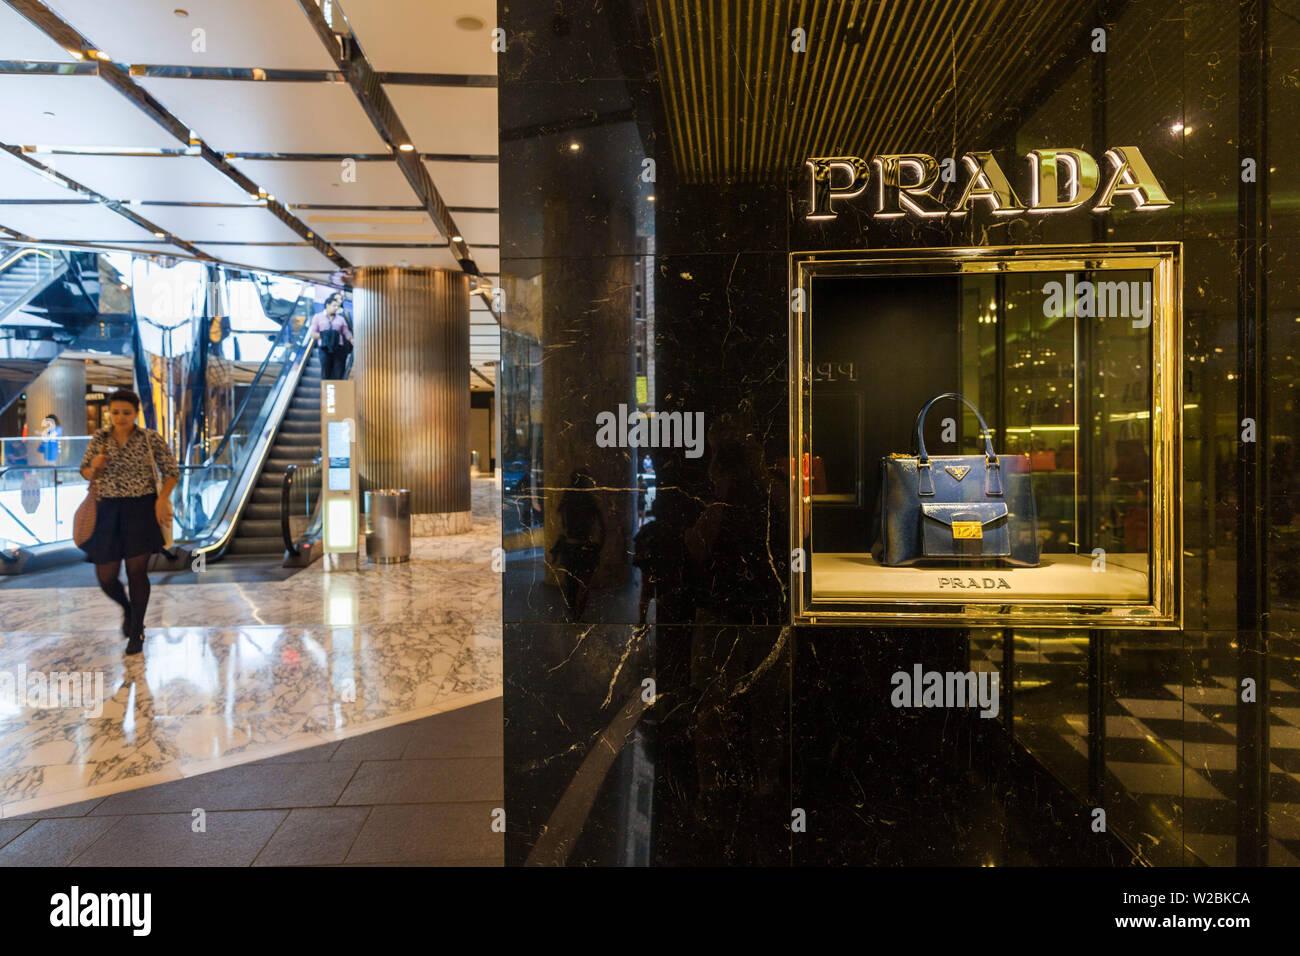 Australia, New South Wales, NSW, Sydney, The Westfield, shopping center, Prada shop exterior Stock Photo